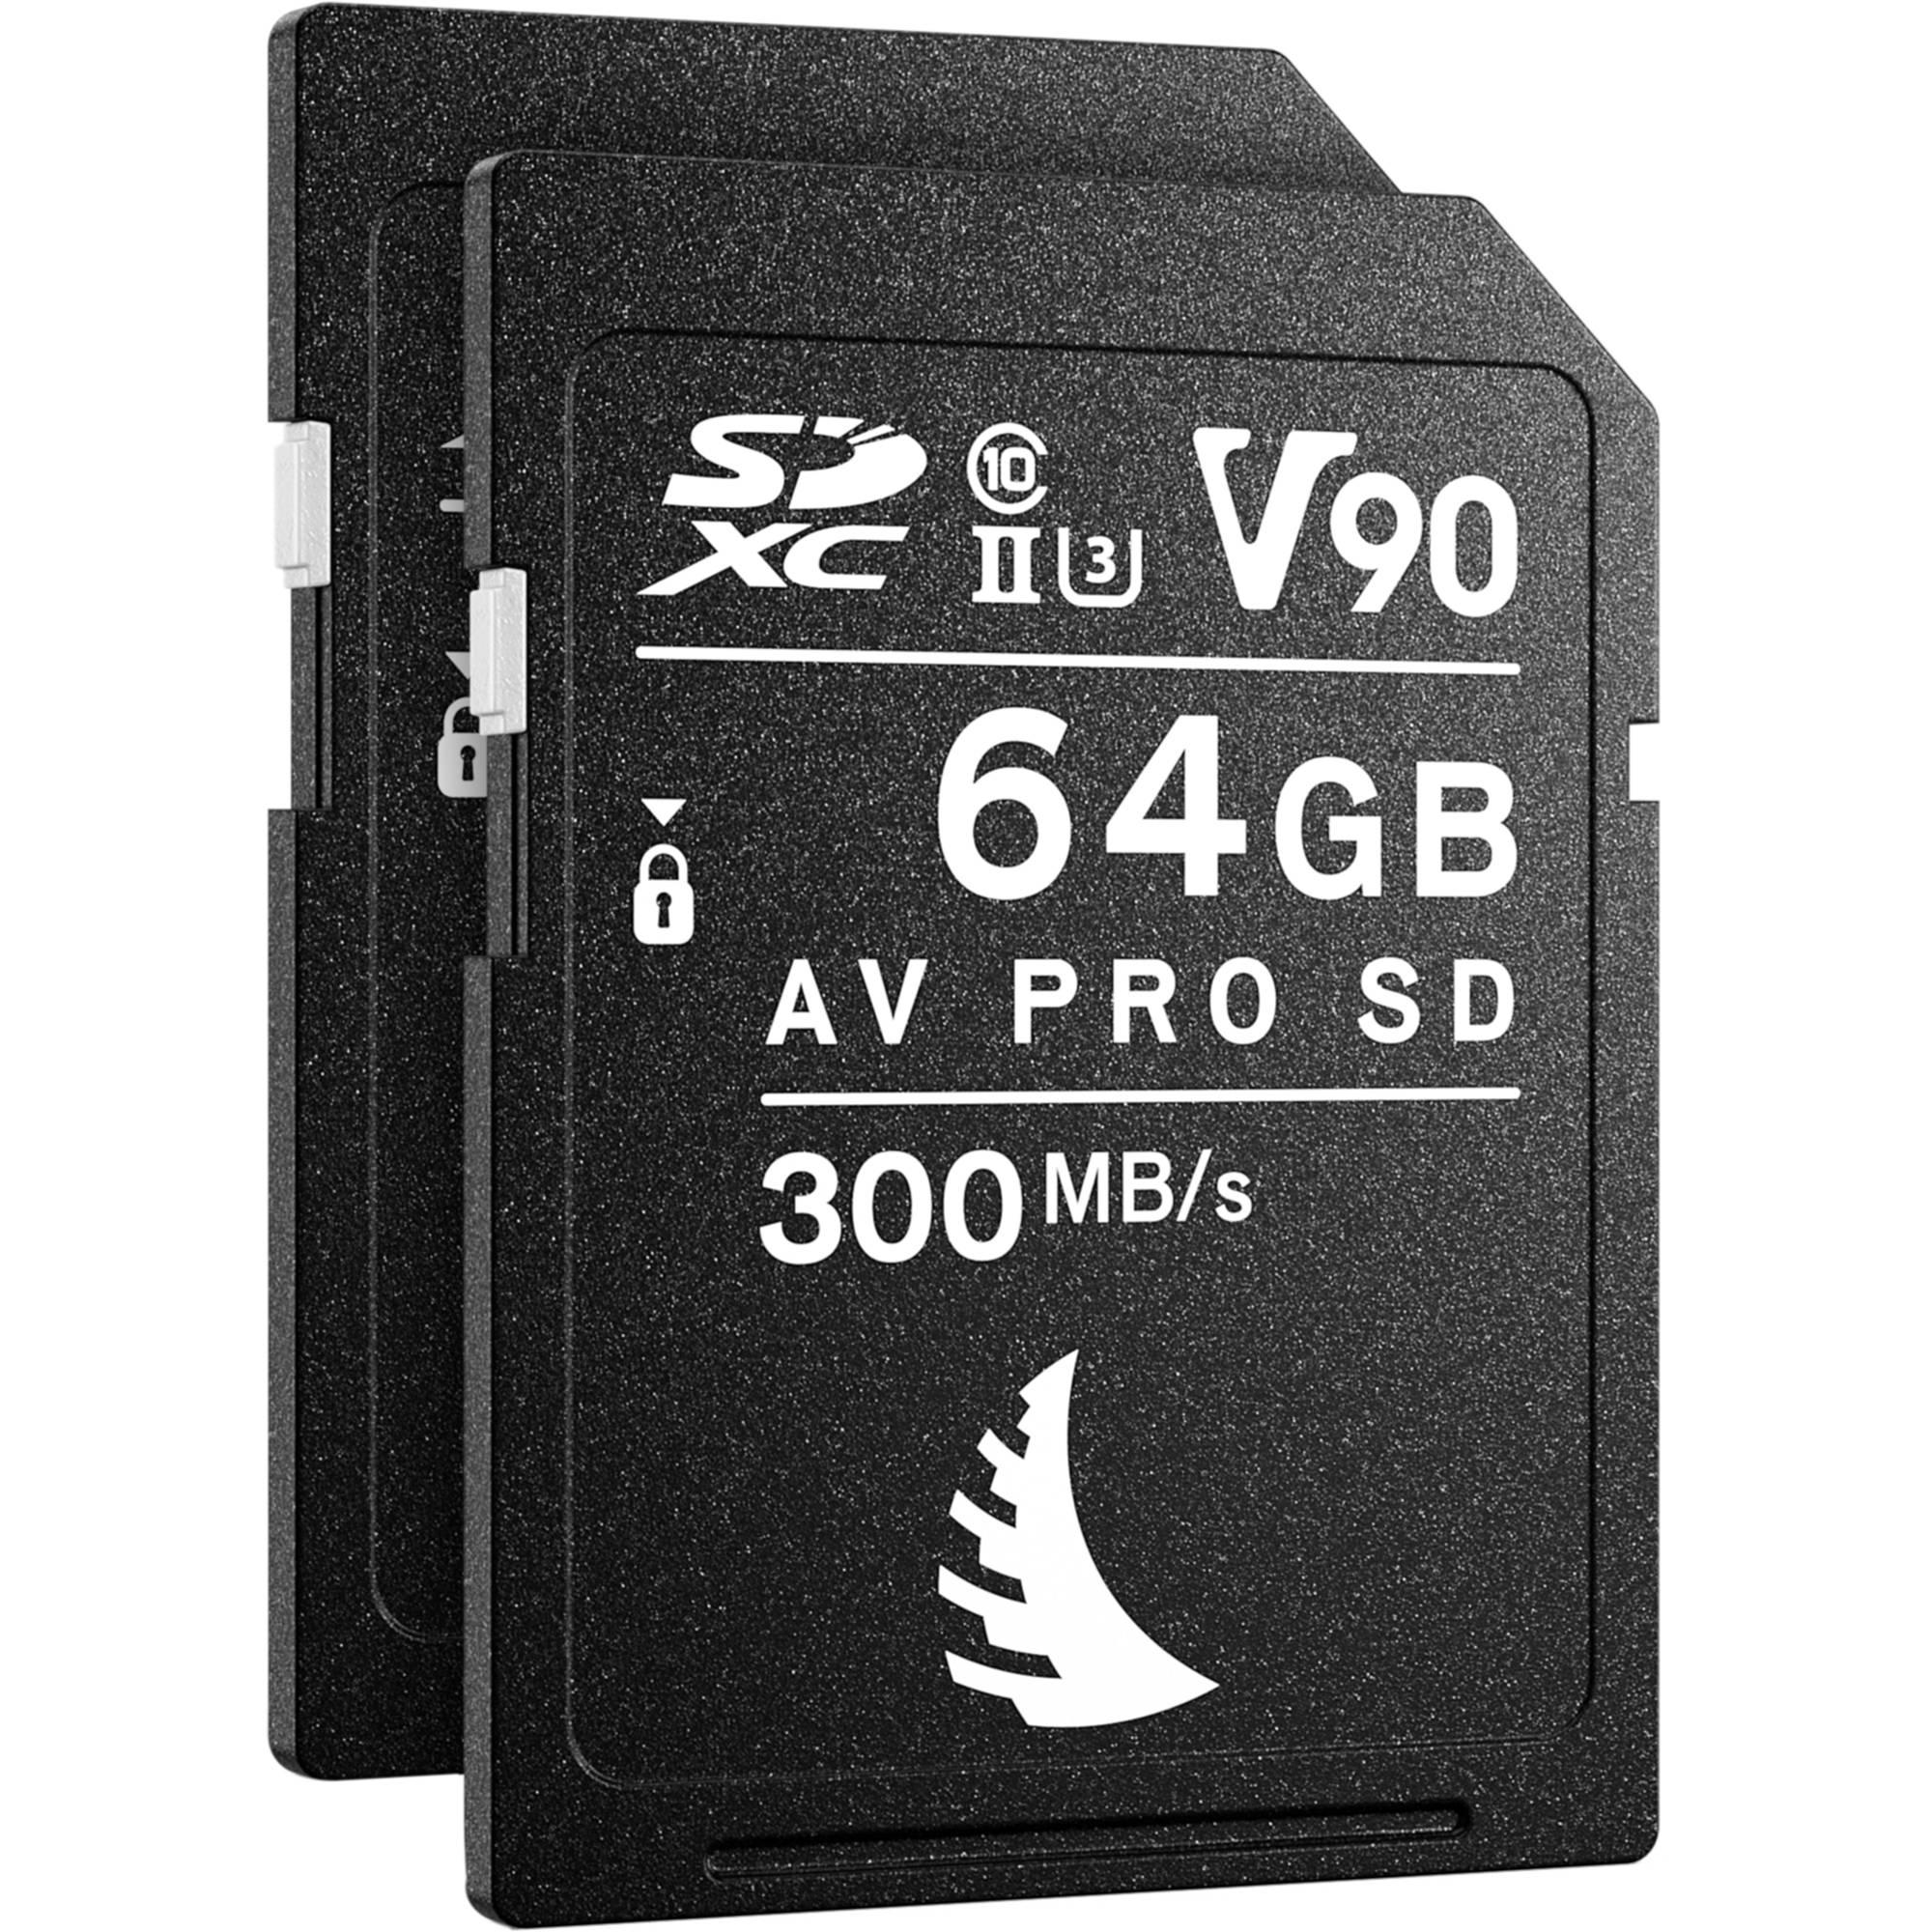 Memory Card Fujifilm X-A3 Digital Camera Memory Card 2 x 128GB Secure Digital Class 10 Extreme Capacity 2 Pack SDXC